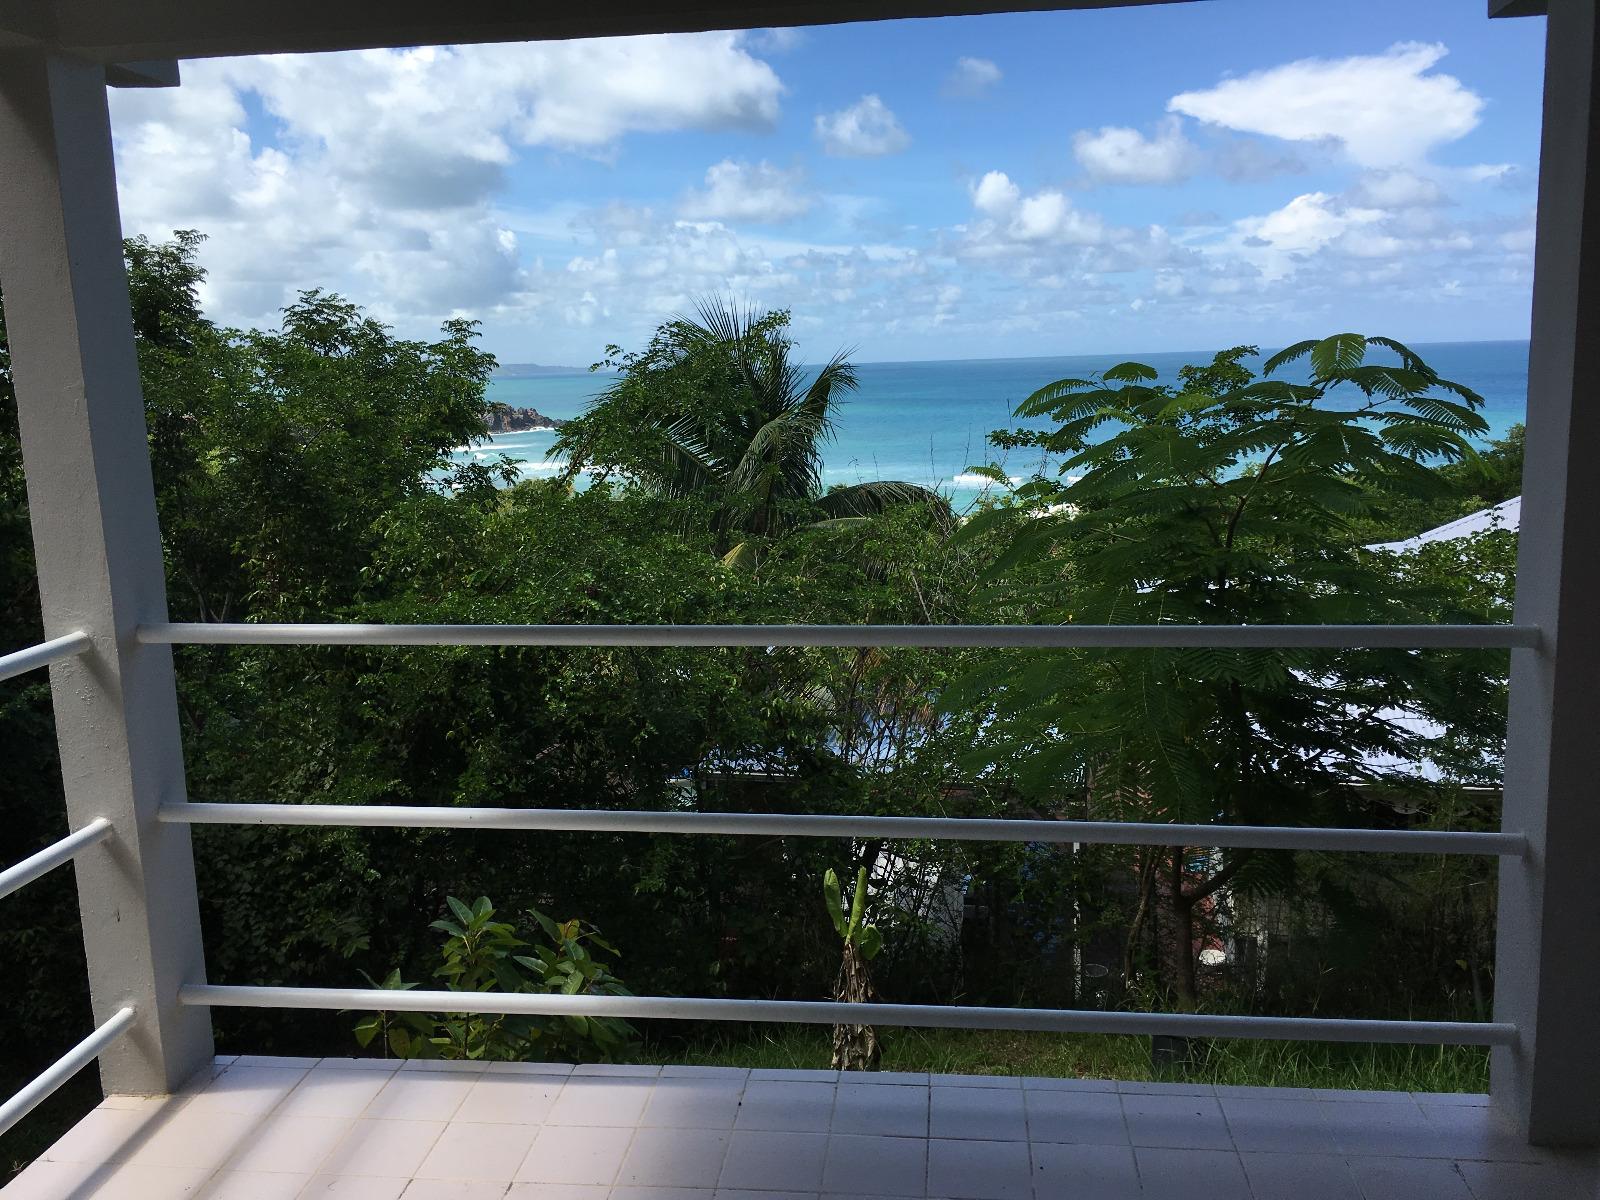 Tartane bel appartement f2 en rdc avec jardin et vue mer for Appartement rdc jardin